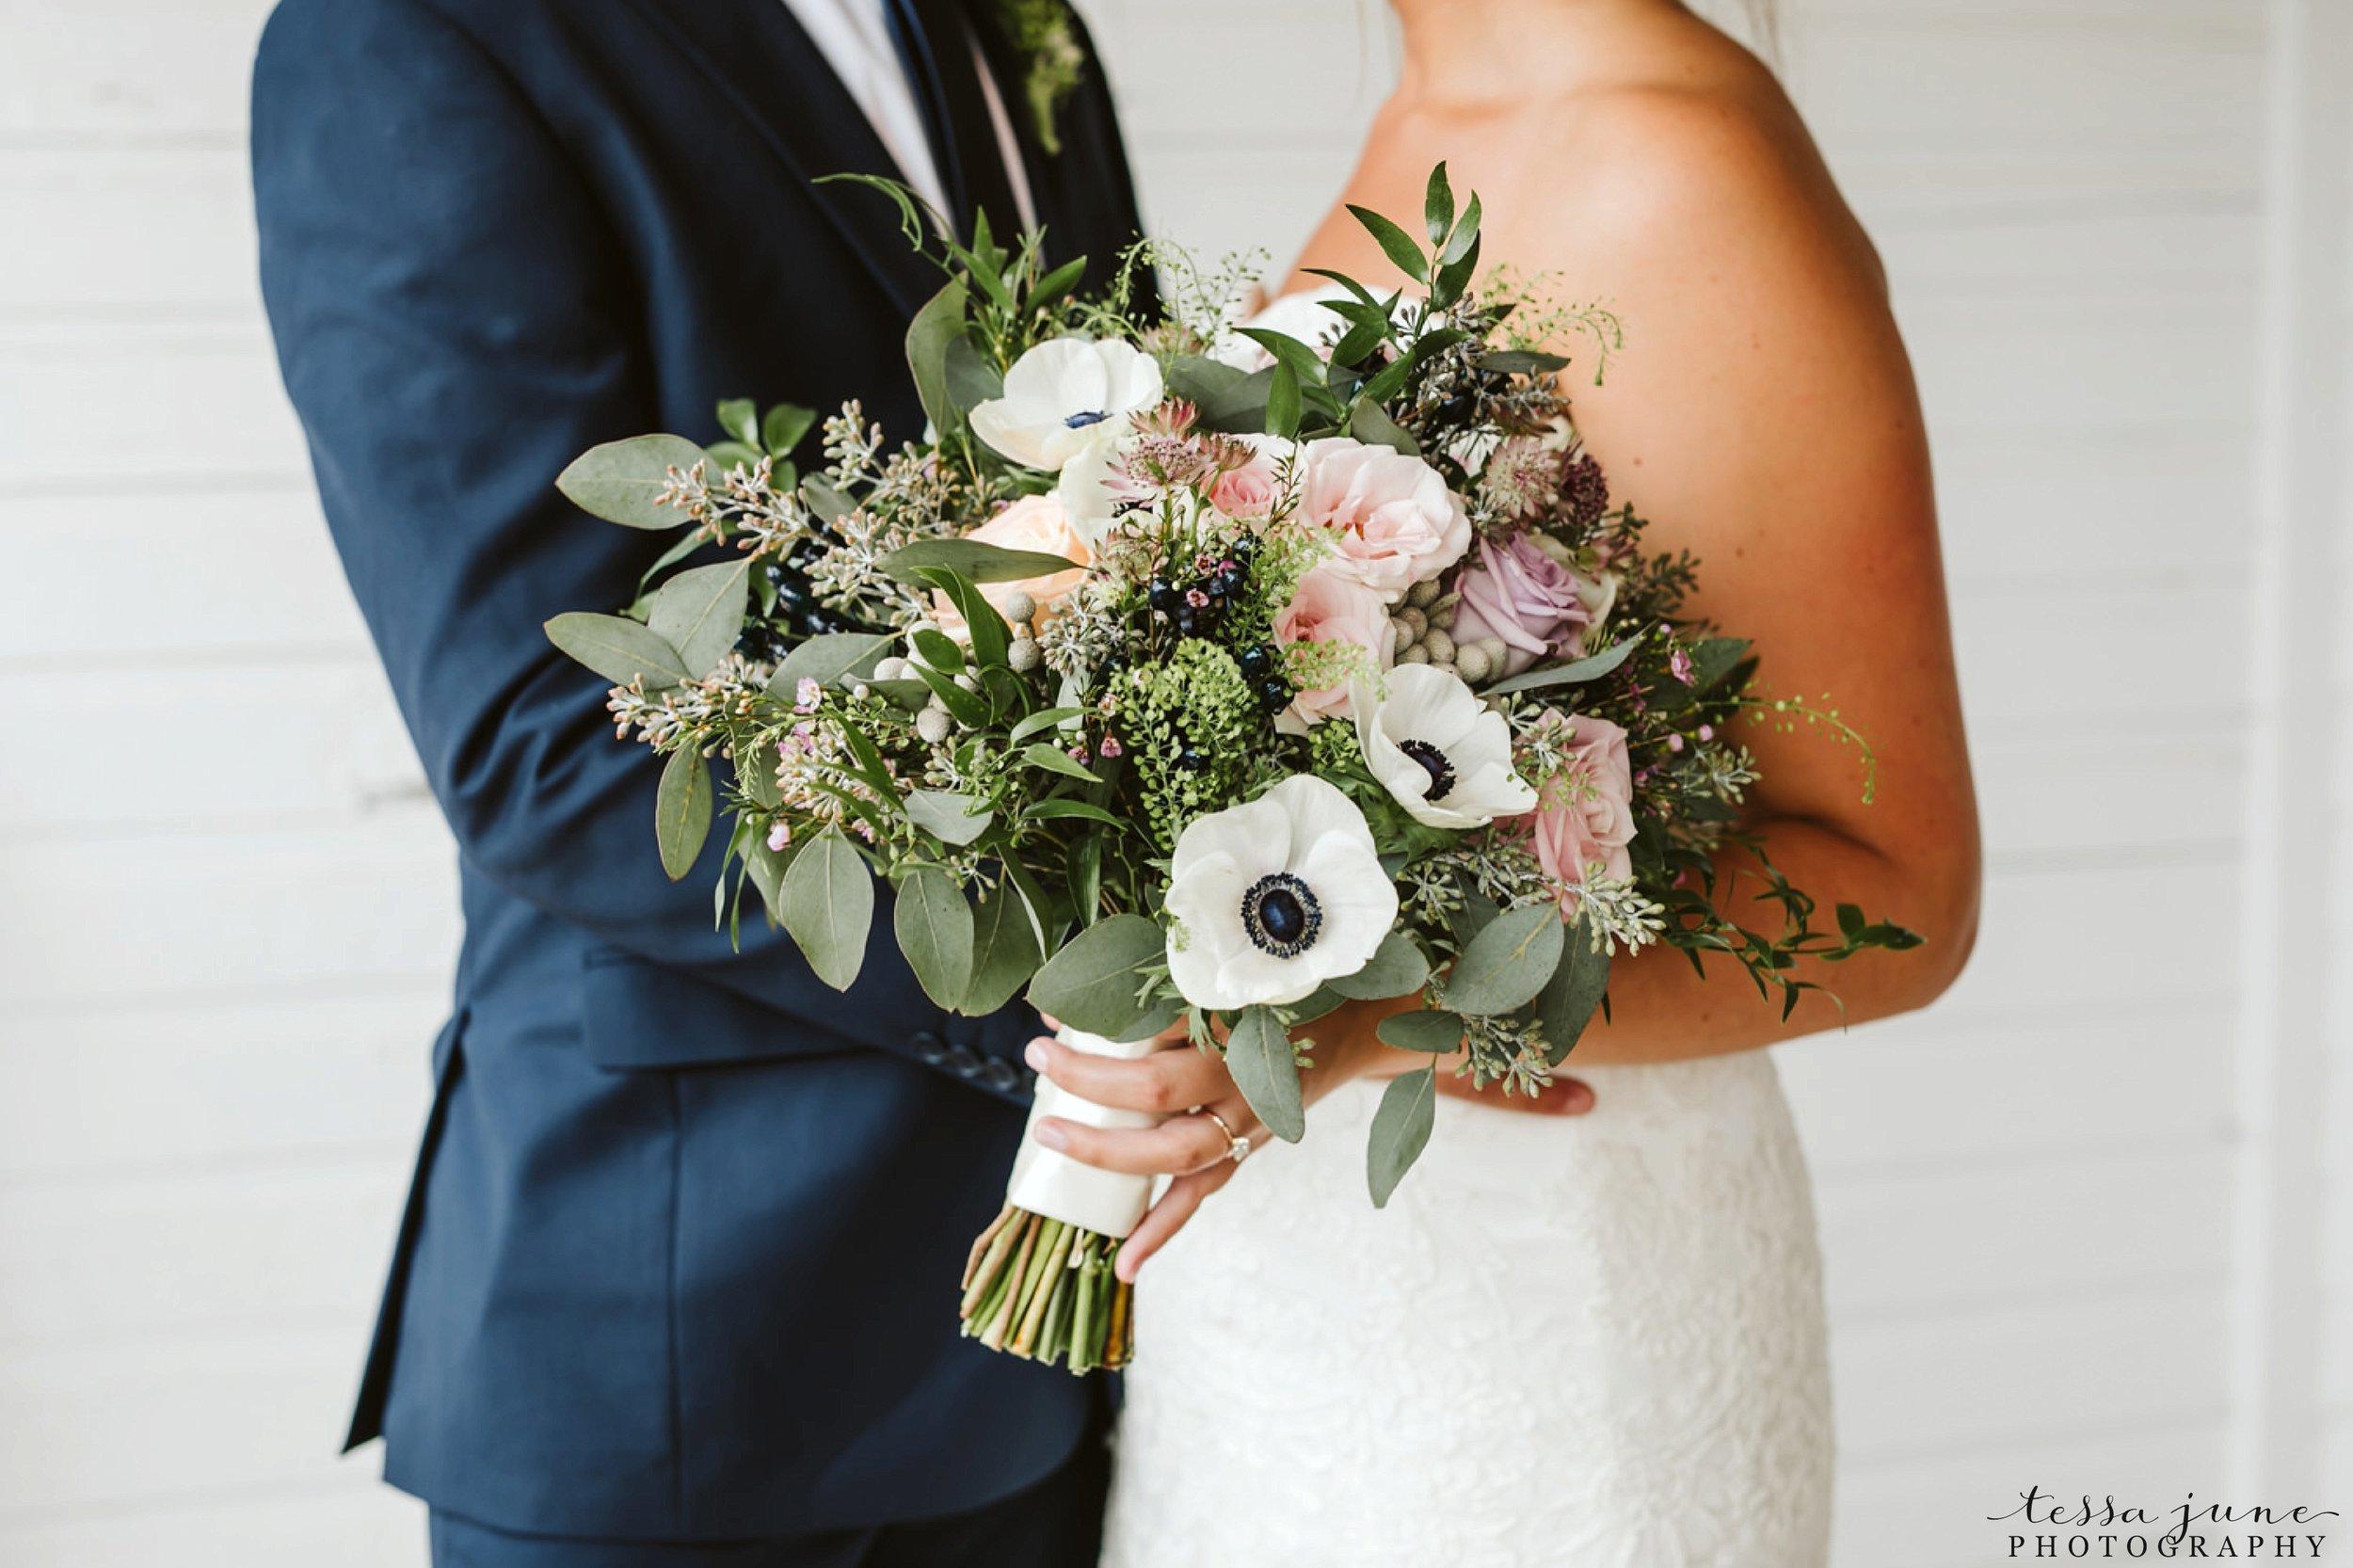 gathered-oaks-barn-wedding-alexandria-minnesota-27.jpg